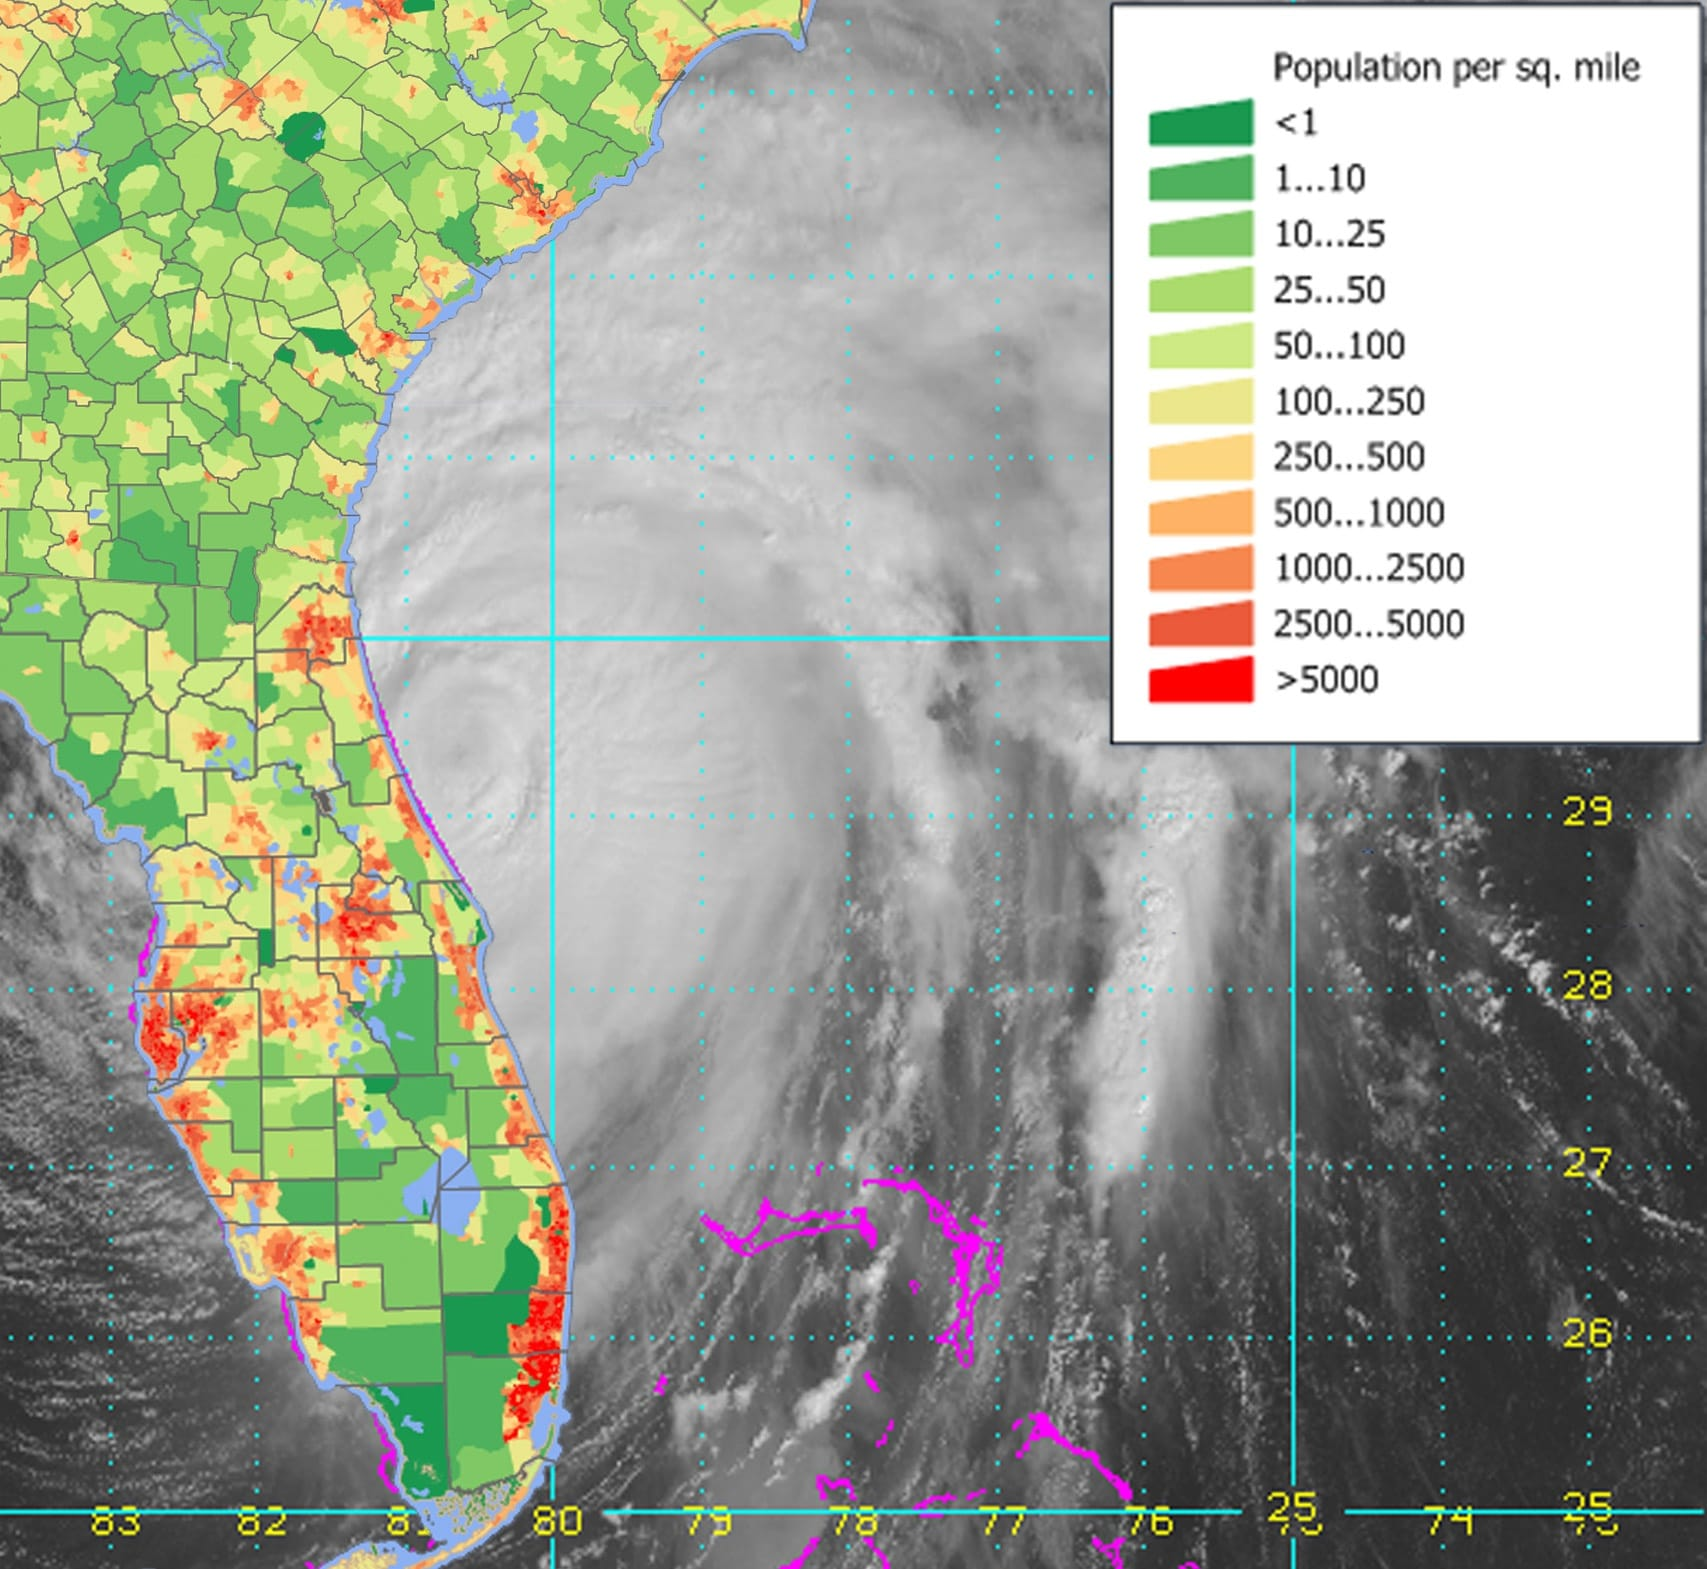 hurricane population per square mile map